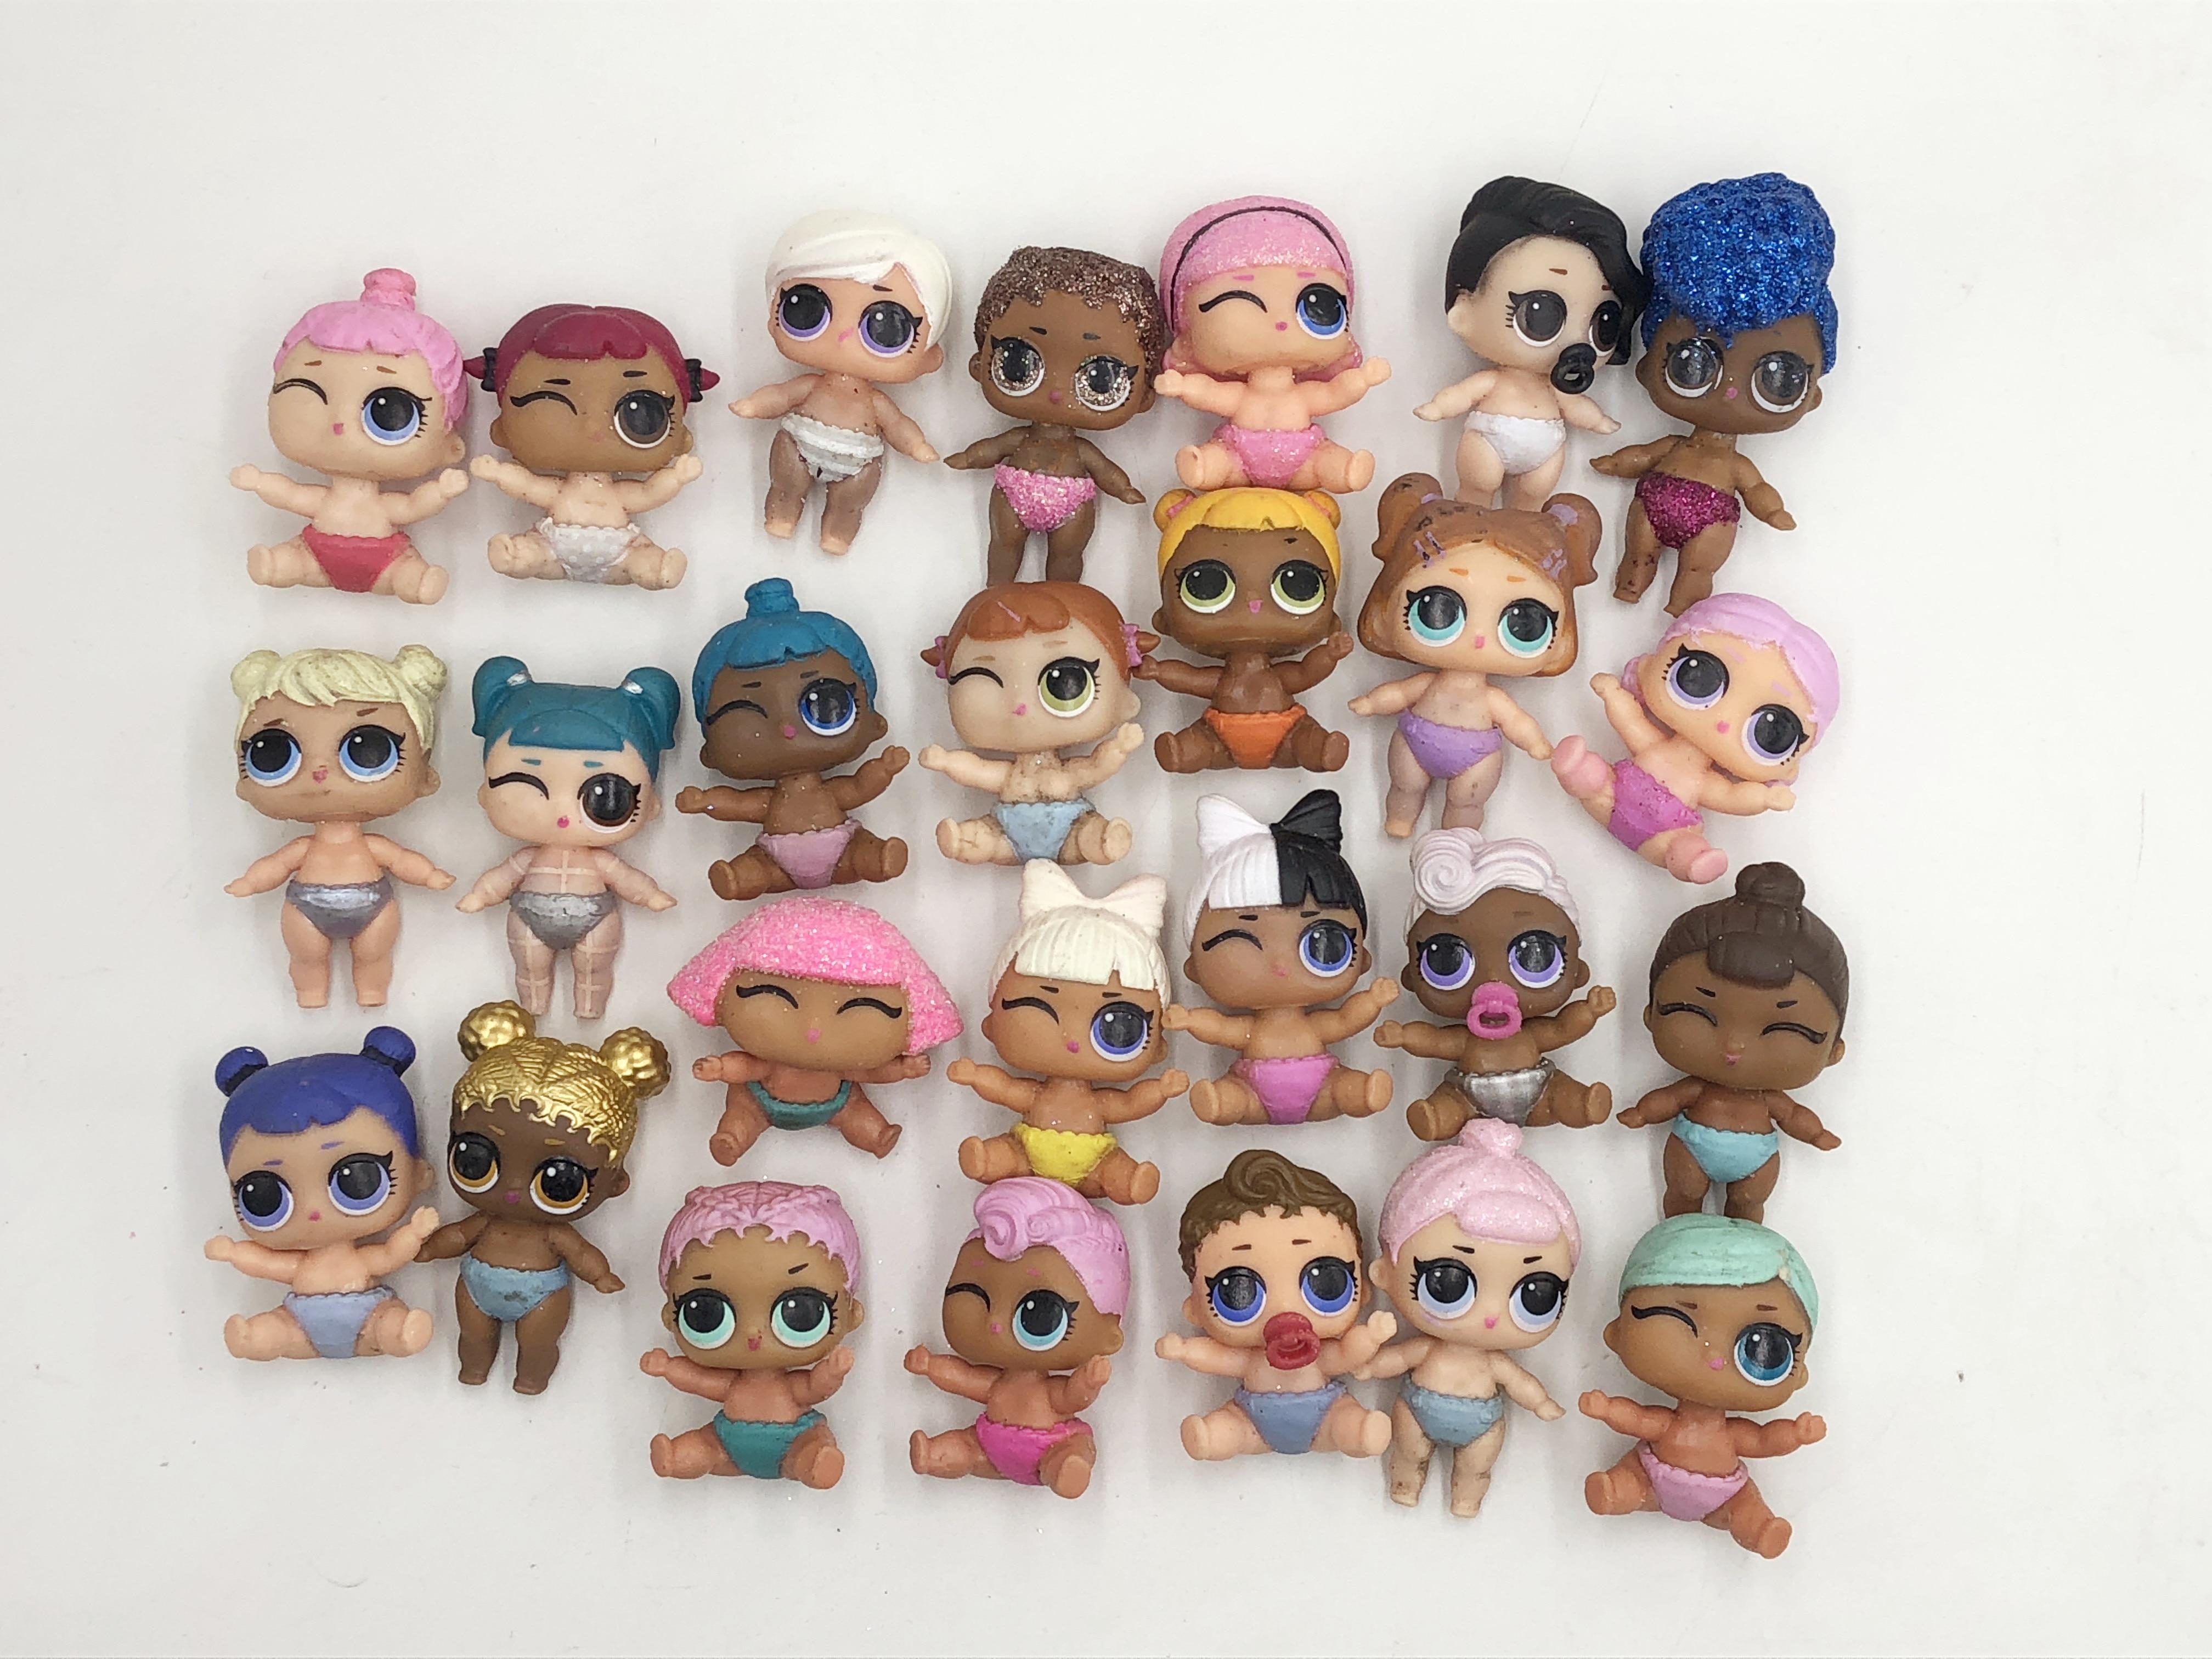 5 PCS Random color Knit Beanie Hat for Lol lil sister dolls